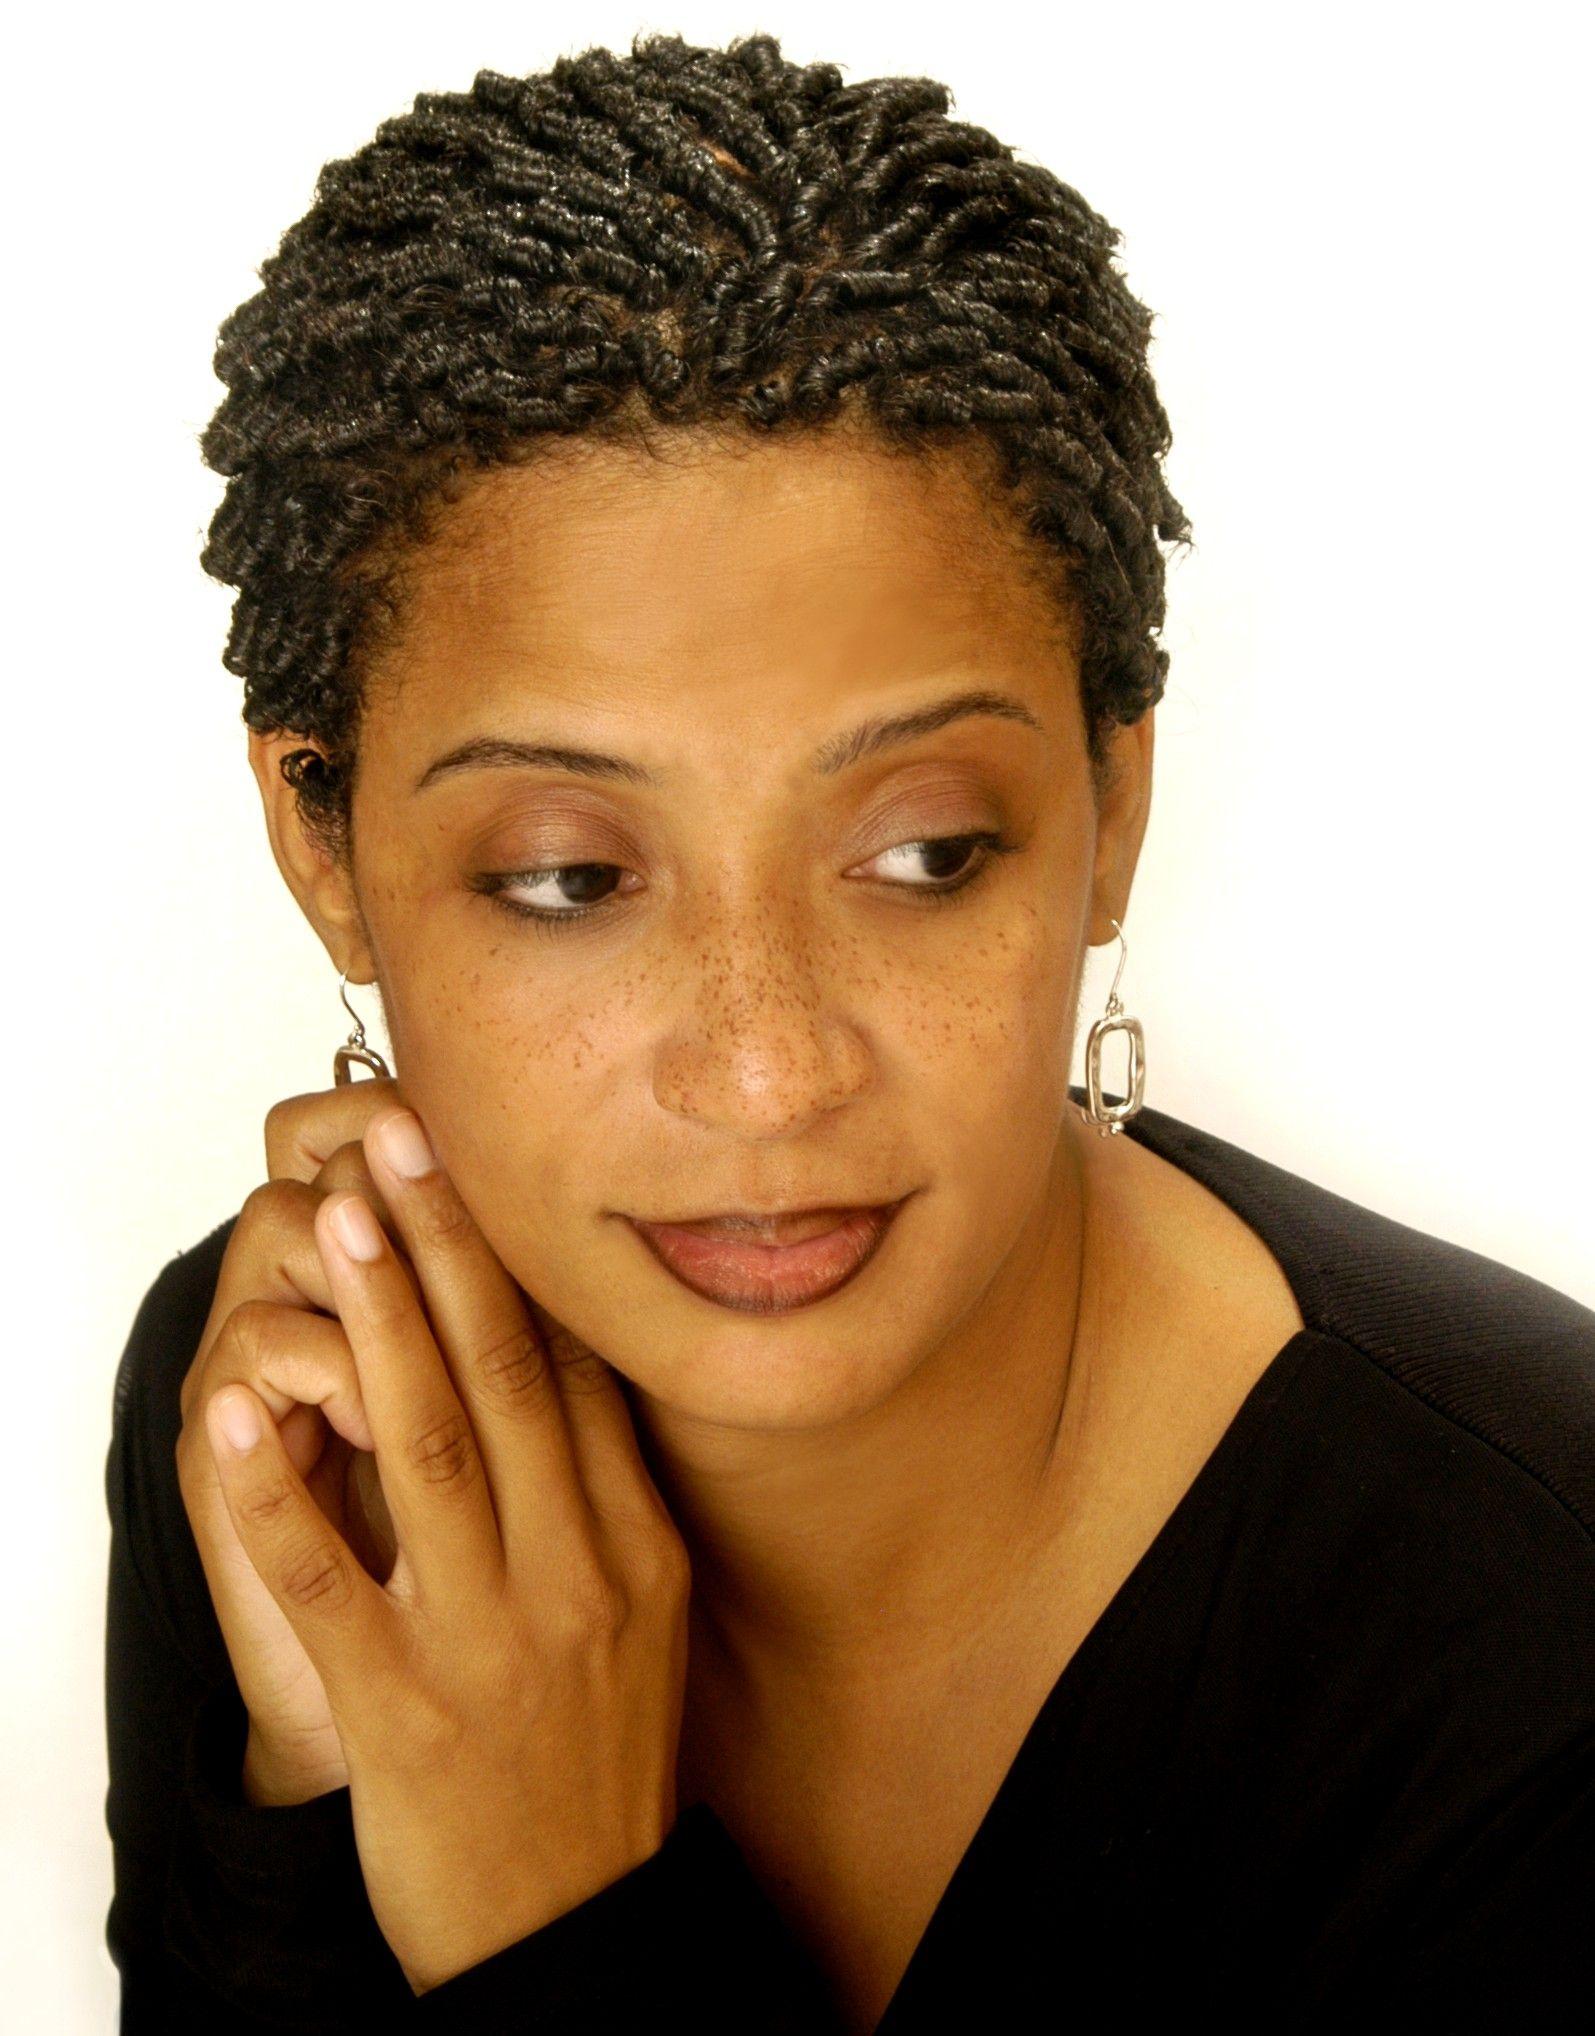 Sensational 1000 Images About Locs On Pinterest Black Women Natural Short Hairstyles Gunalazisus